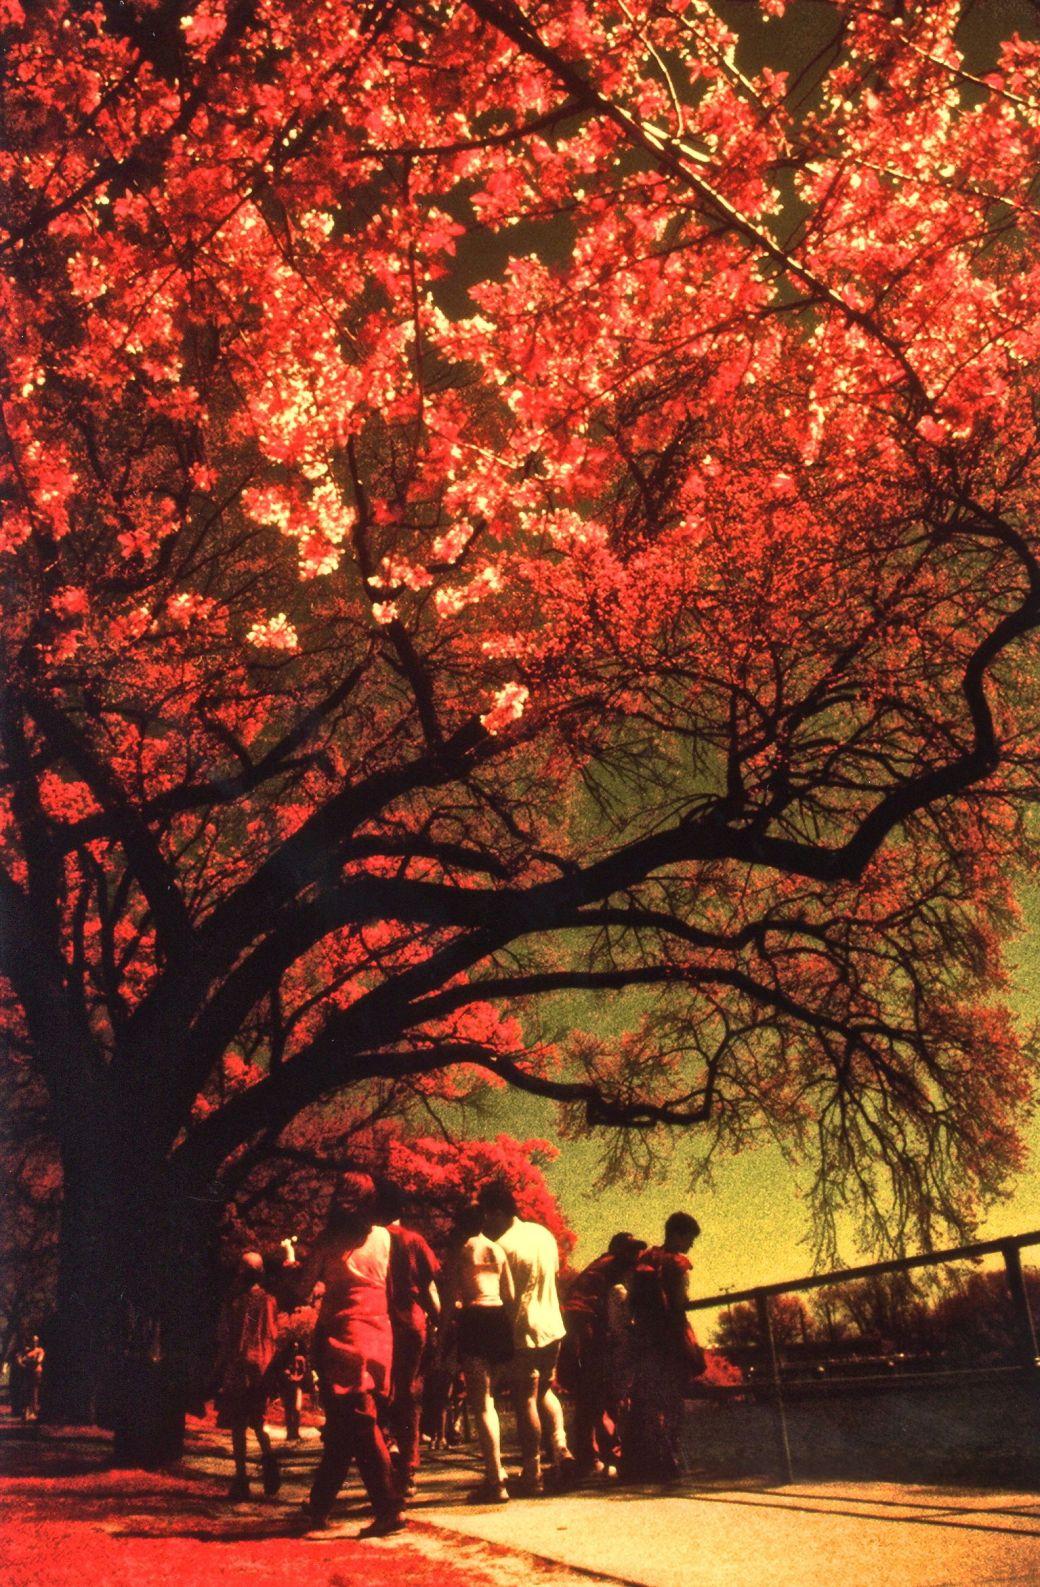 washington dc cherry blossoms color infrared film 2001 1